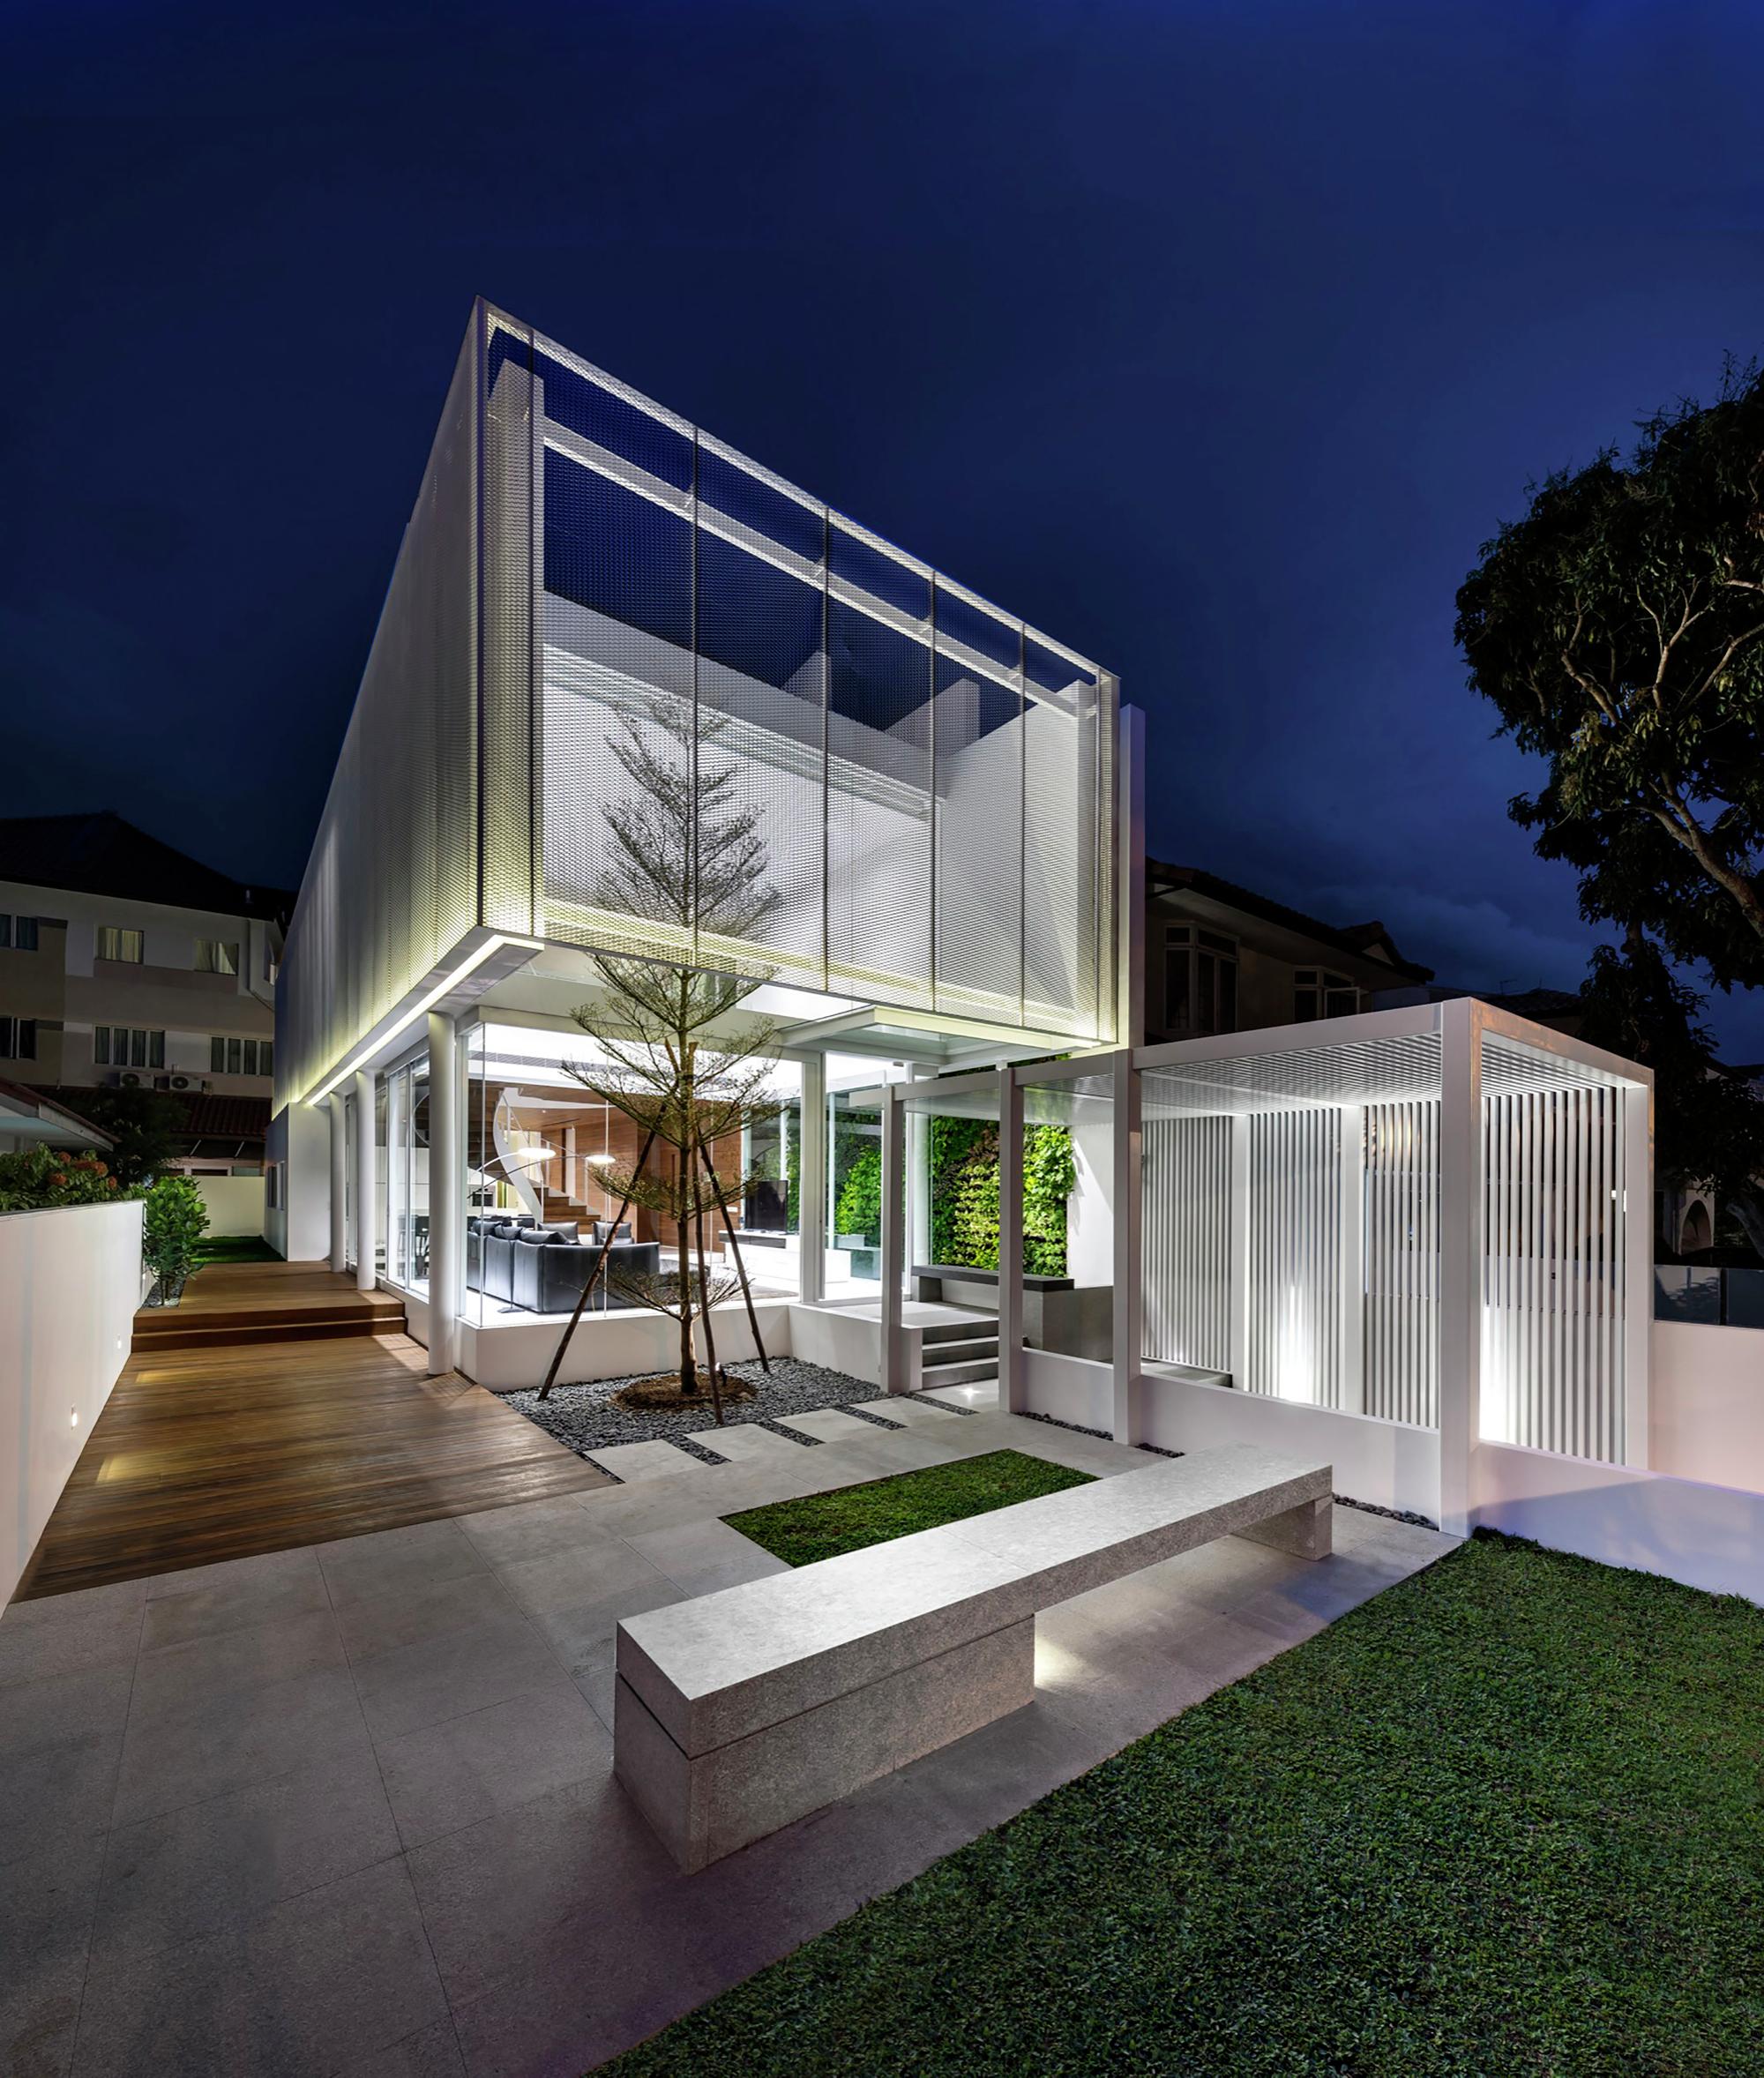 Galeria de casa greja park associates 6 for Casa moderna 7 mirote y blancana